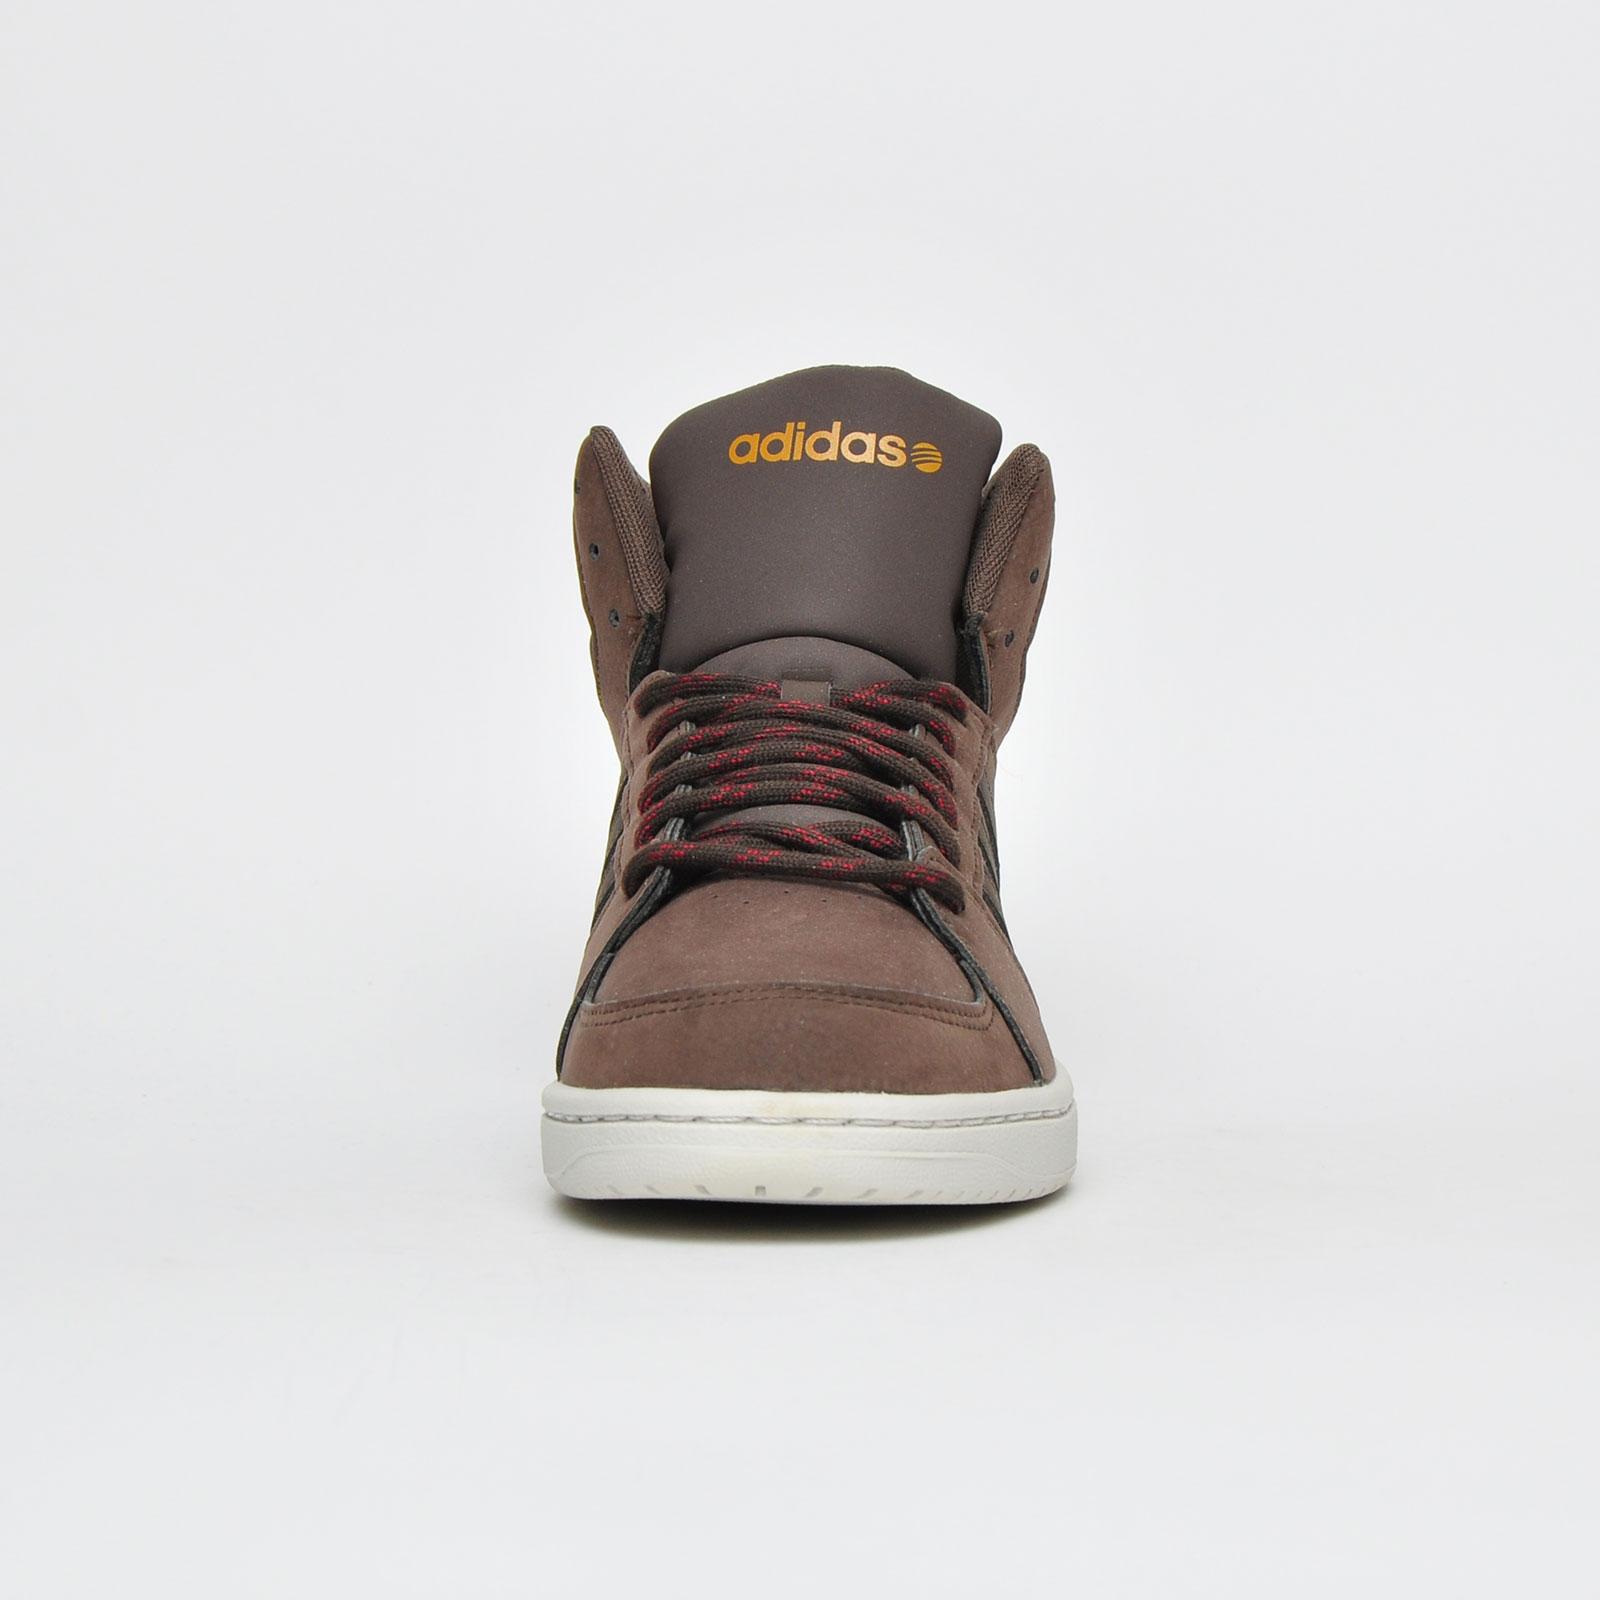 adidas neo marron online